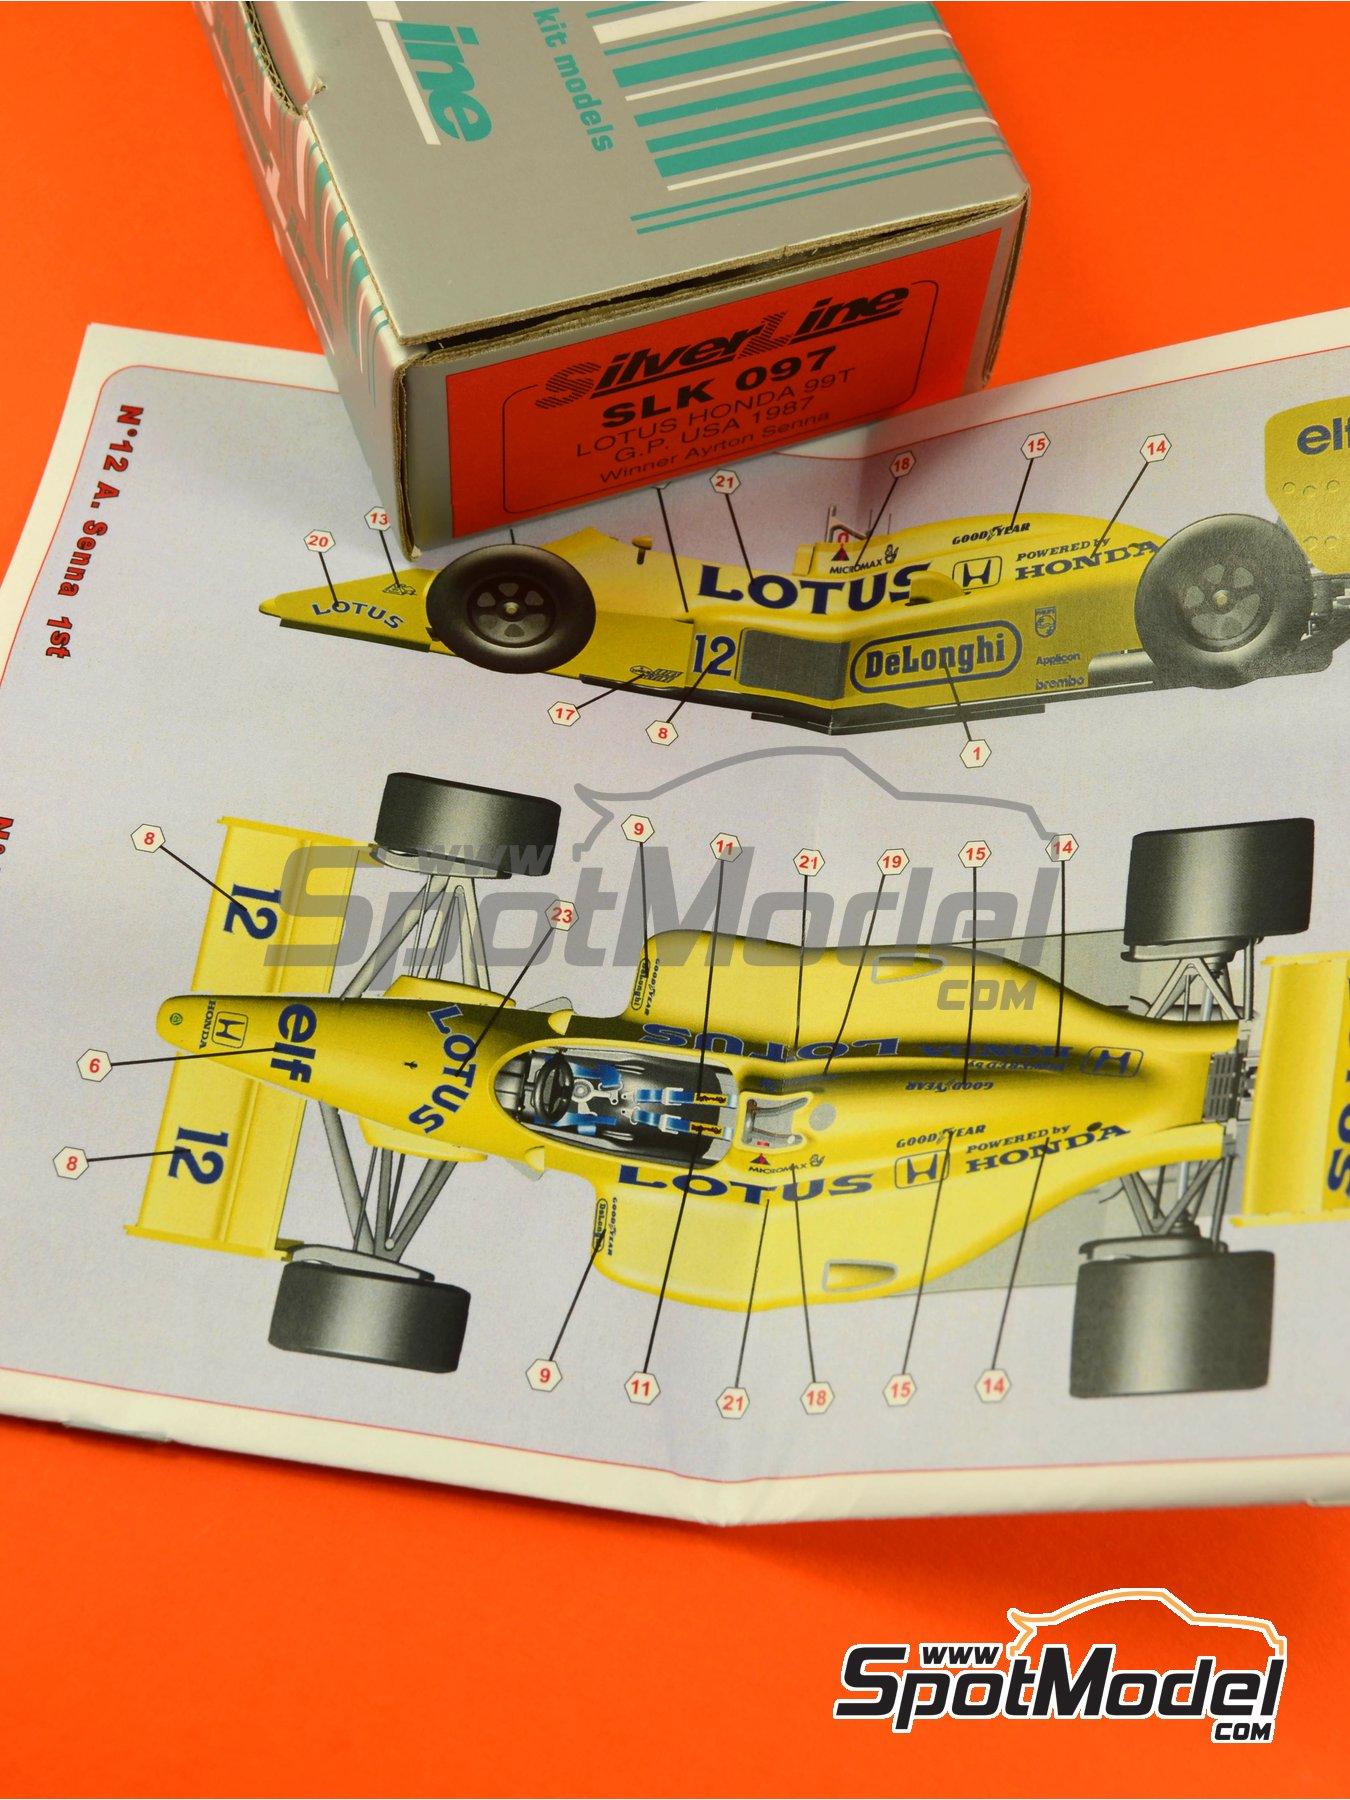 Lotus Honda 99T Camel - USA Formula 1 Grand Prix 1987 | Model car kit in 1/43 scale manufactured by Tameo Kits (ref.SLK097) image